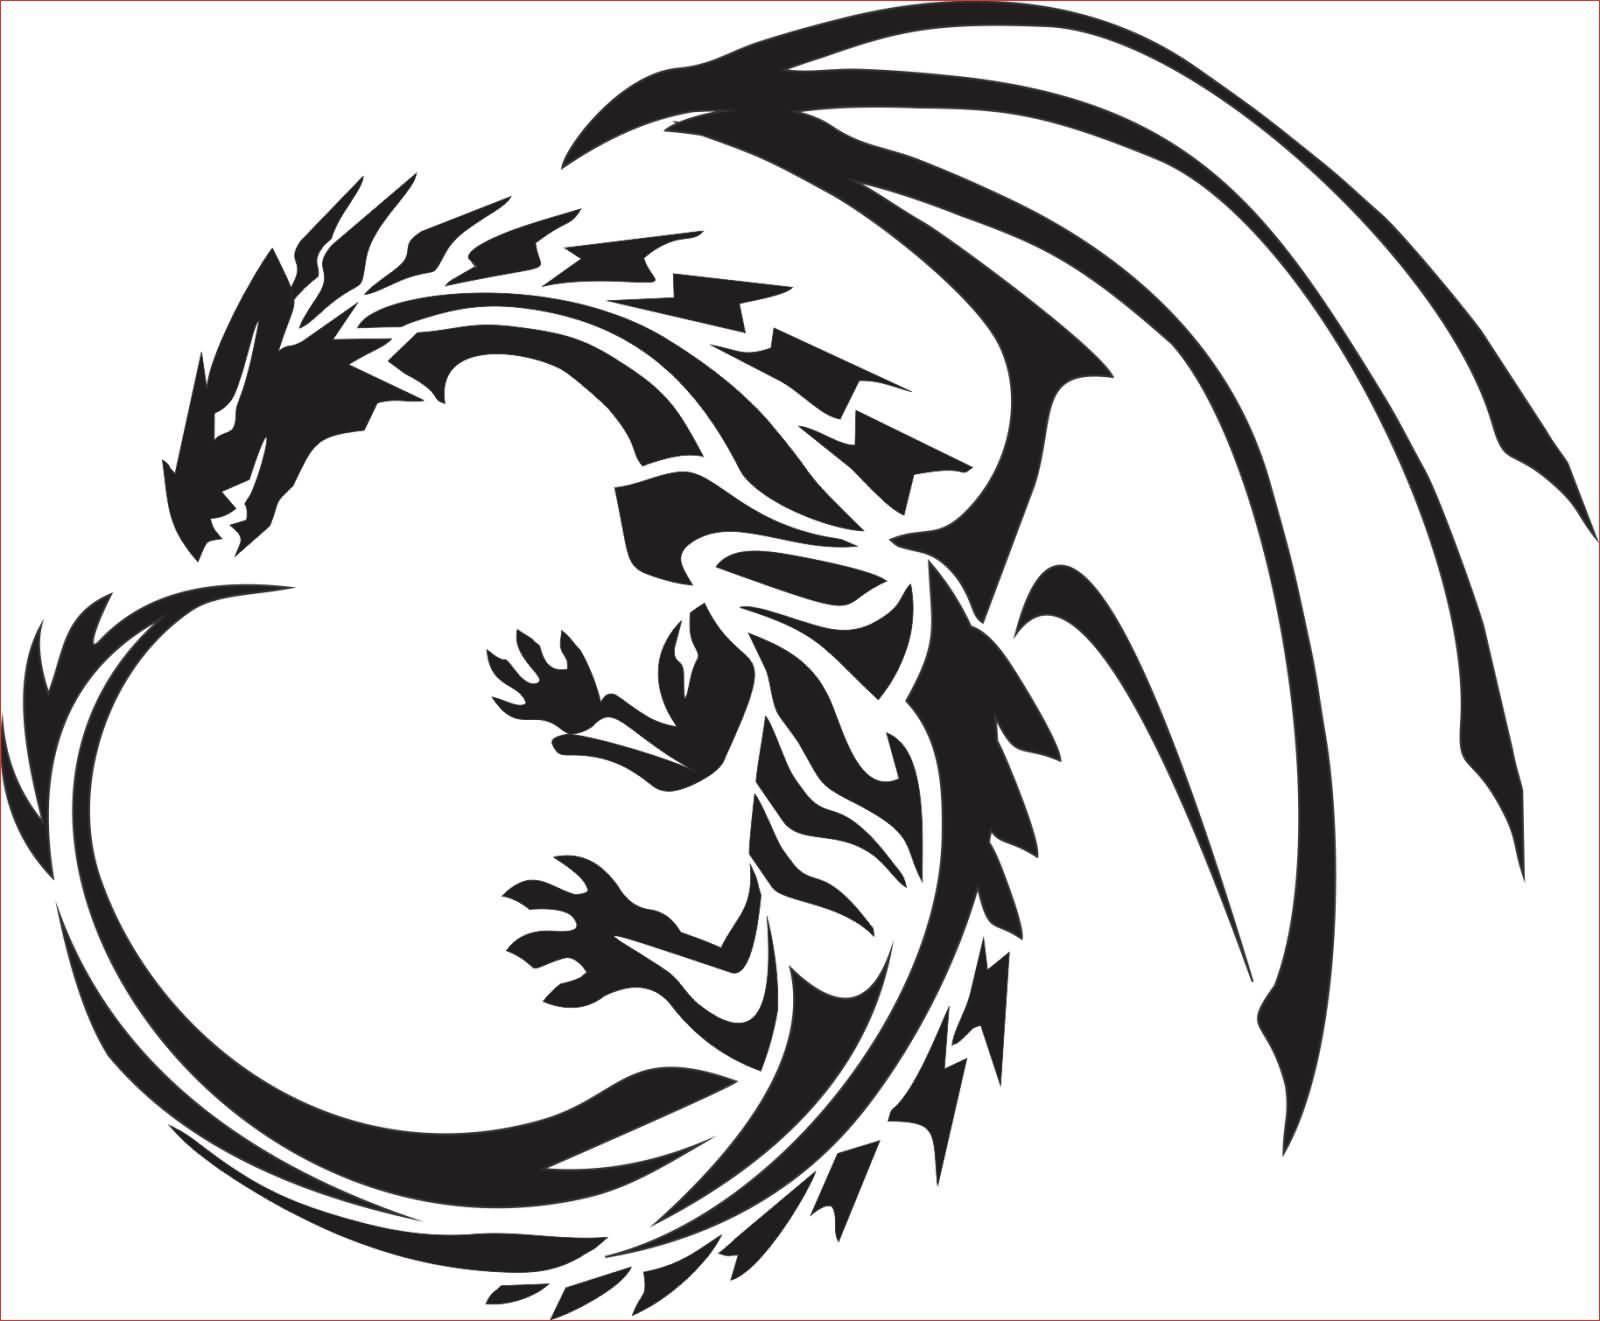 Best Of Tribal Chinese Dragon Tattoos We Otomotive Info Tribal Dragon Tattoos Dragon Silhouette Dragon Tattoo